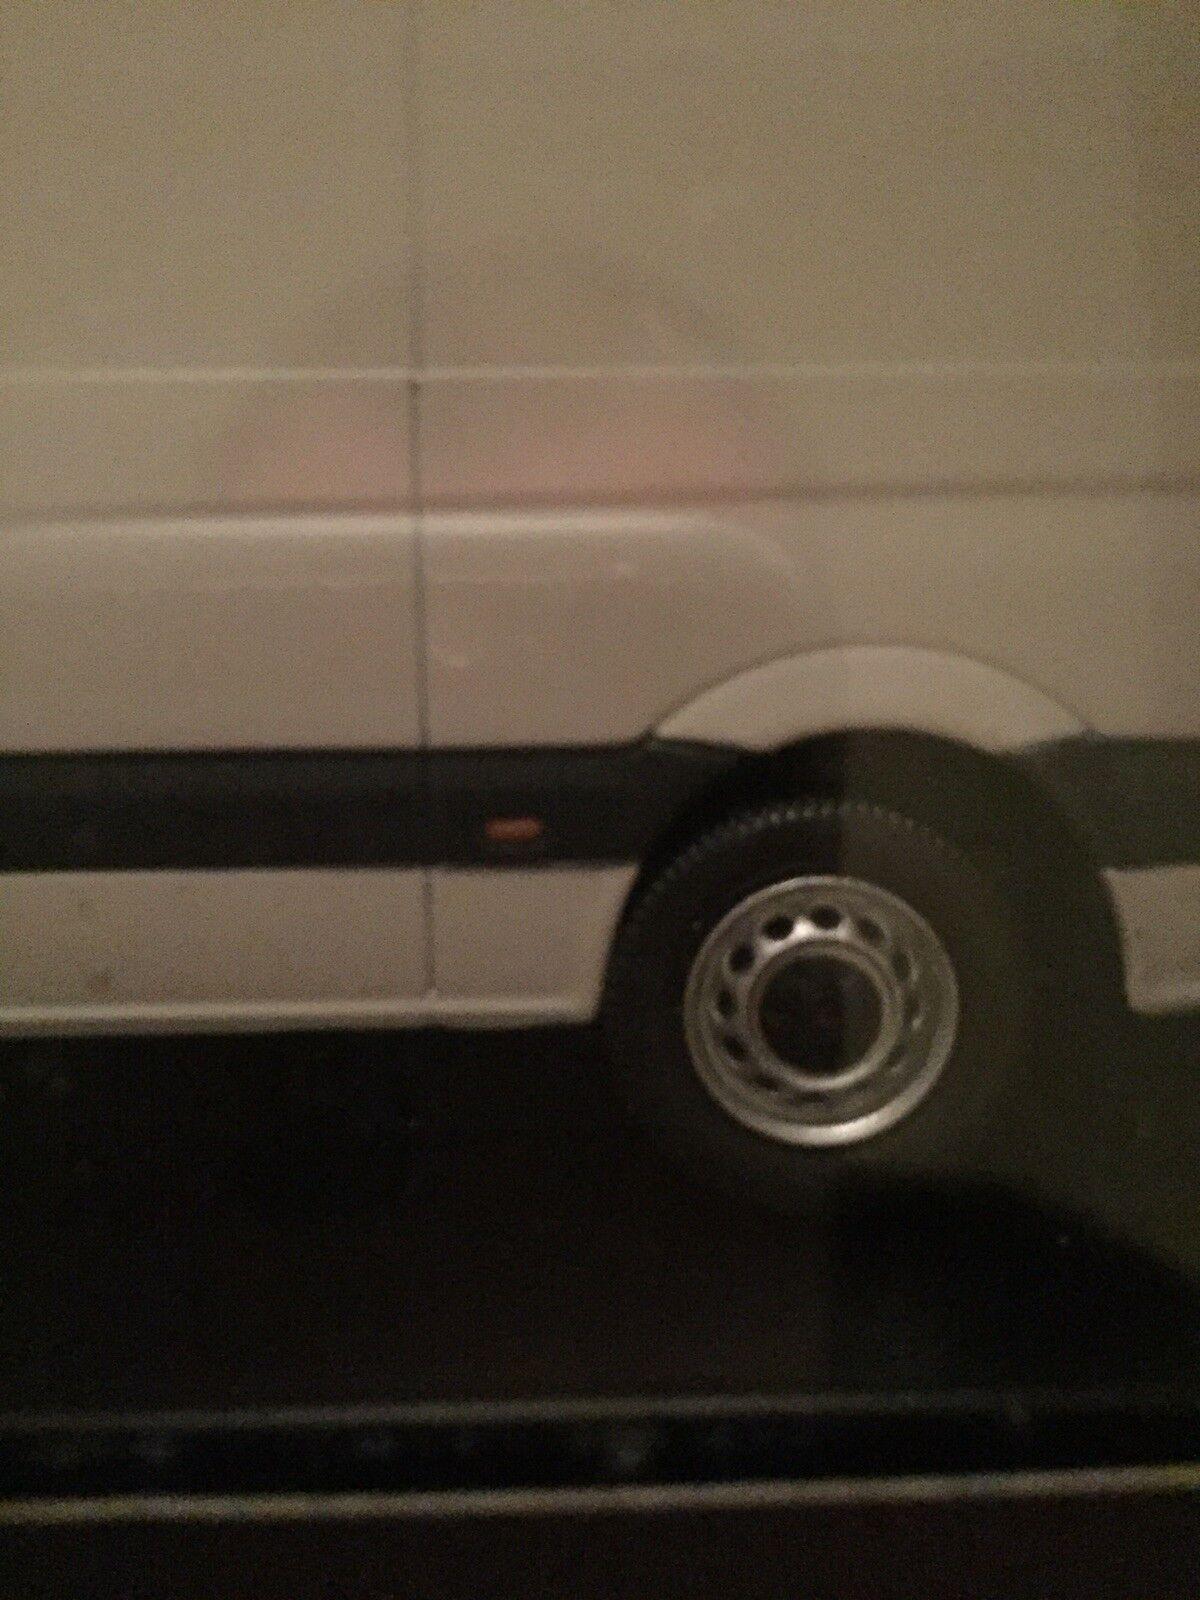 VW CRAFTER 2E TDI FACELIFT FACELIFT FACELIFT CANDY WHITE 1 43 PREMIUM CLASSIXXS (DEALER MODEL) 4e2e72